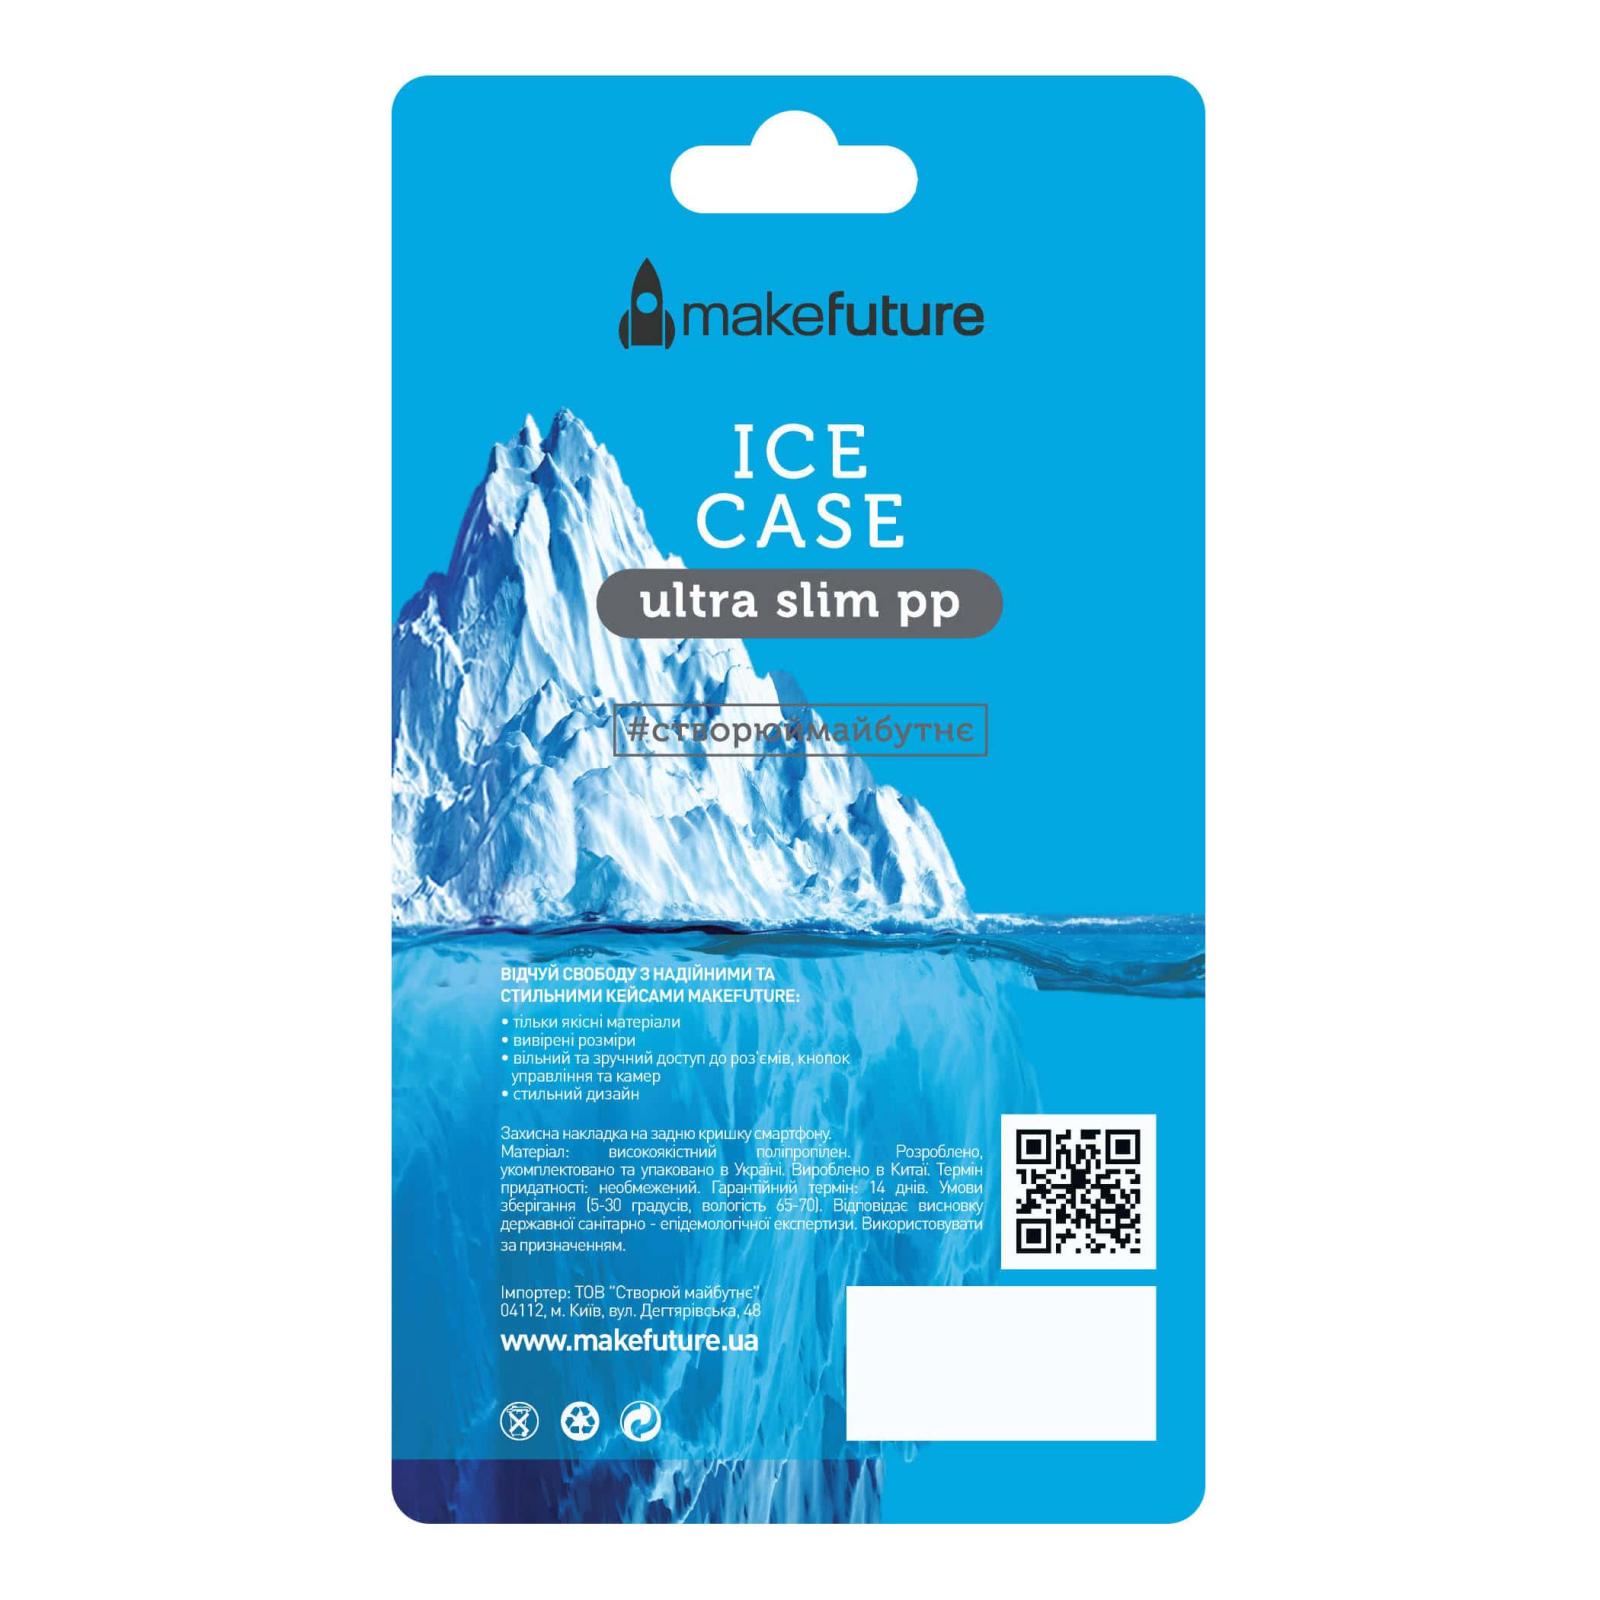 Чехол для моб. телефона MakeFuture Ice Case (PP) для Apple iPhone 6 White (MCI-AI6WH) изображение 6